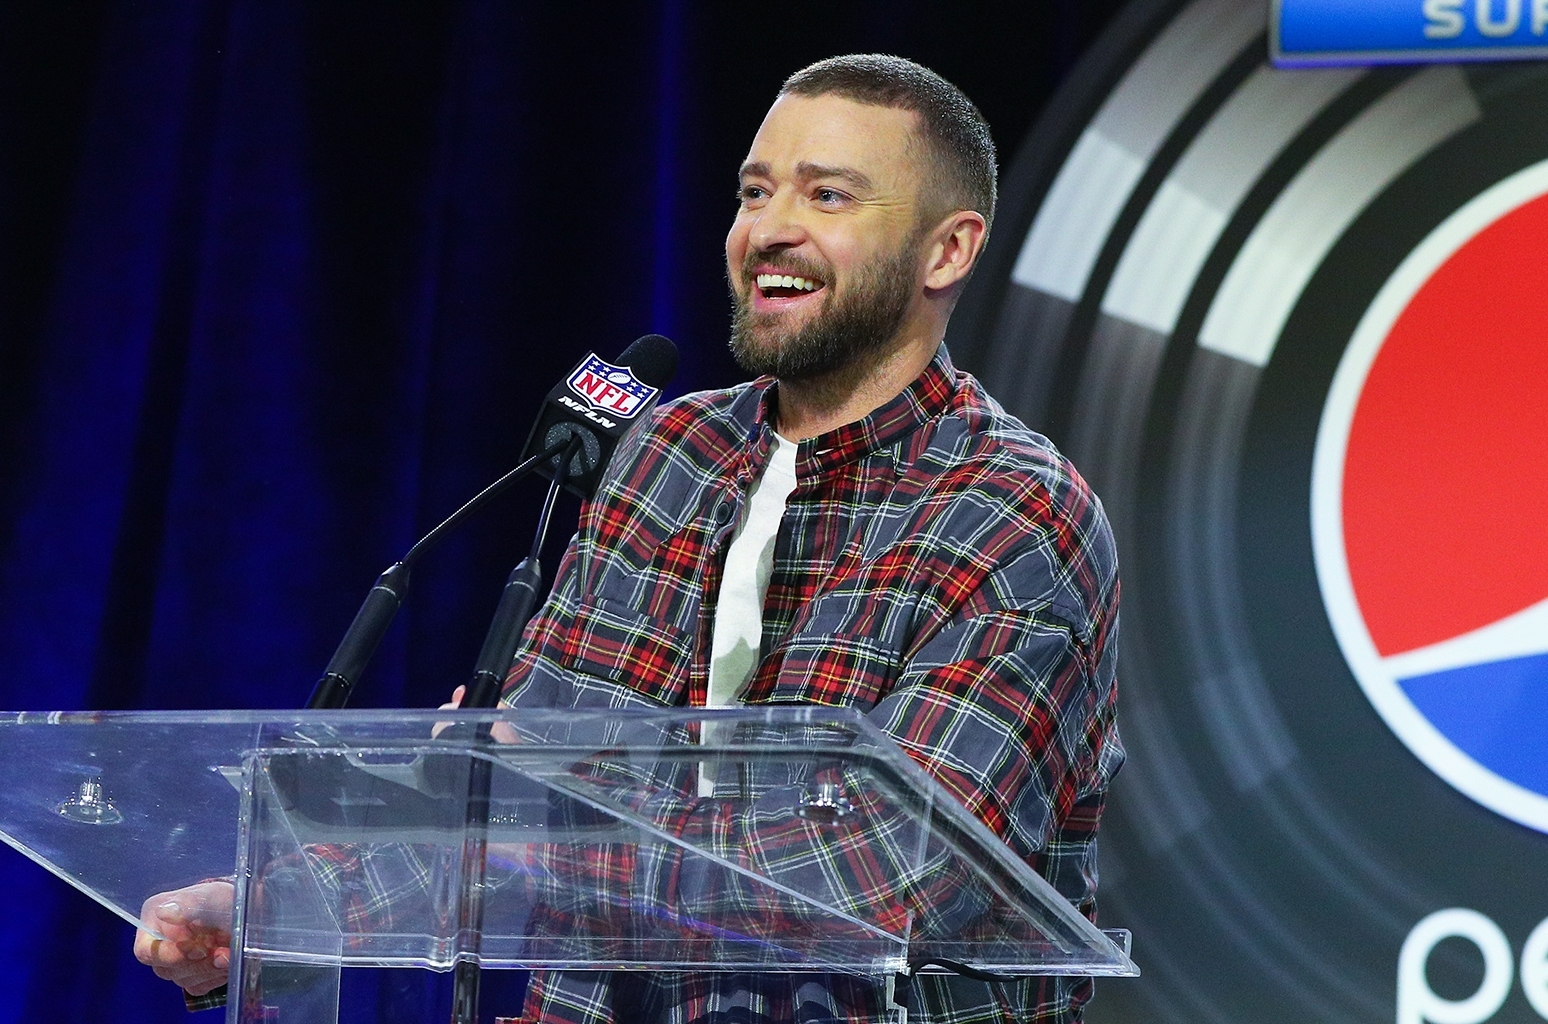 Justin Timberlake's Super Bowl Halftime Show: He Confirms No inside Justin Timberlake Super Bowl